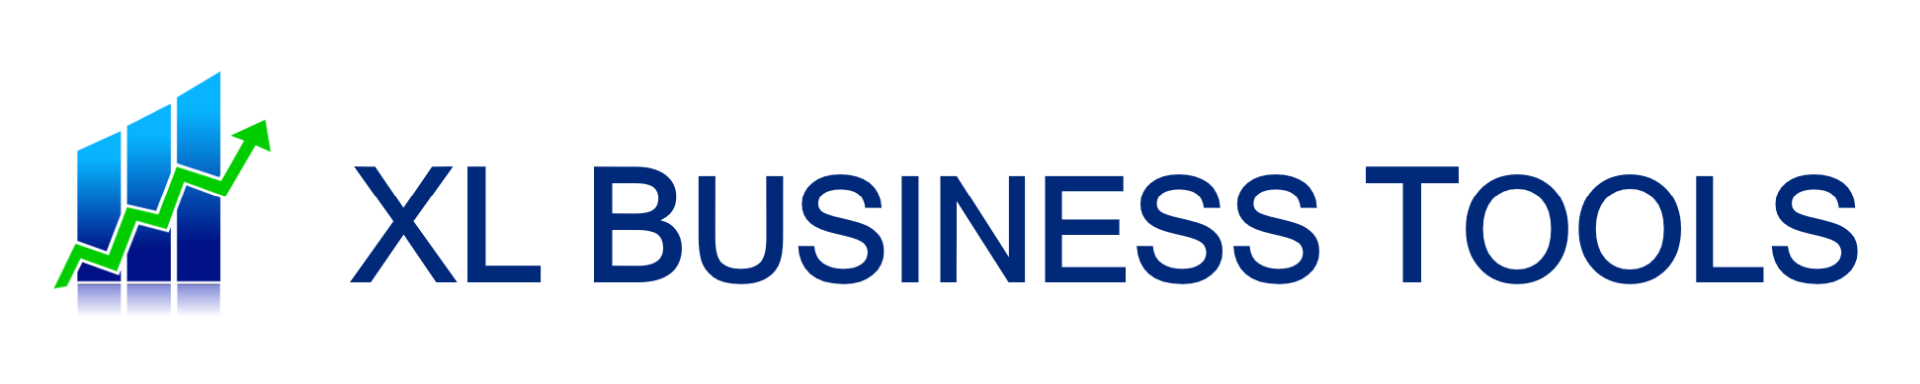 Rejoindre le Blog XL Business Tools